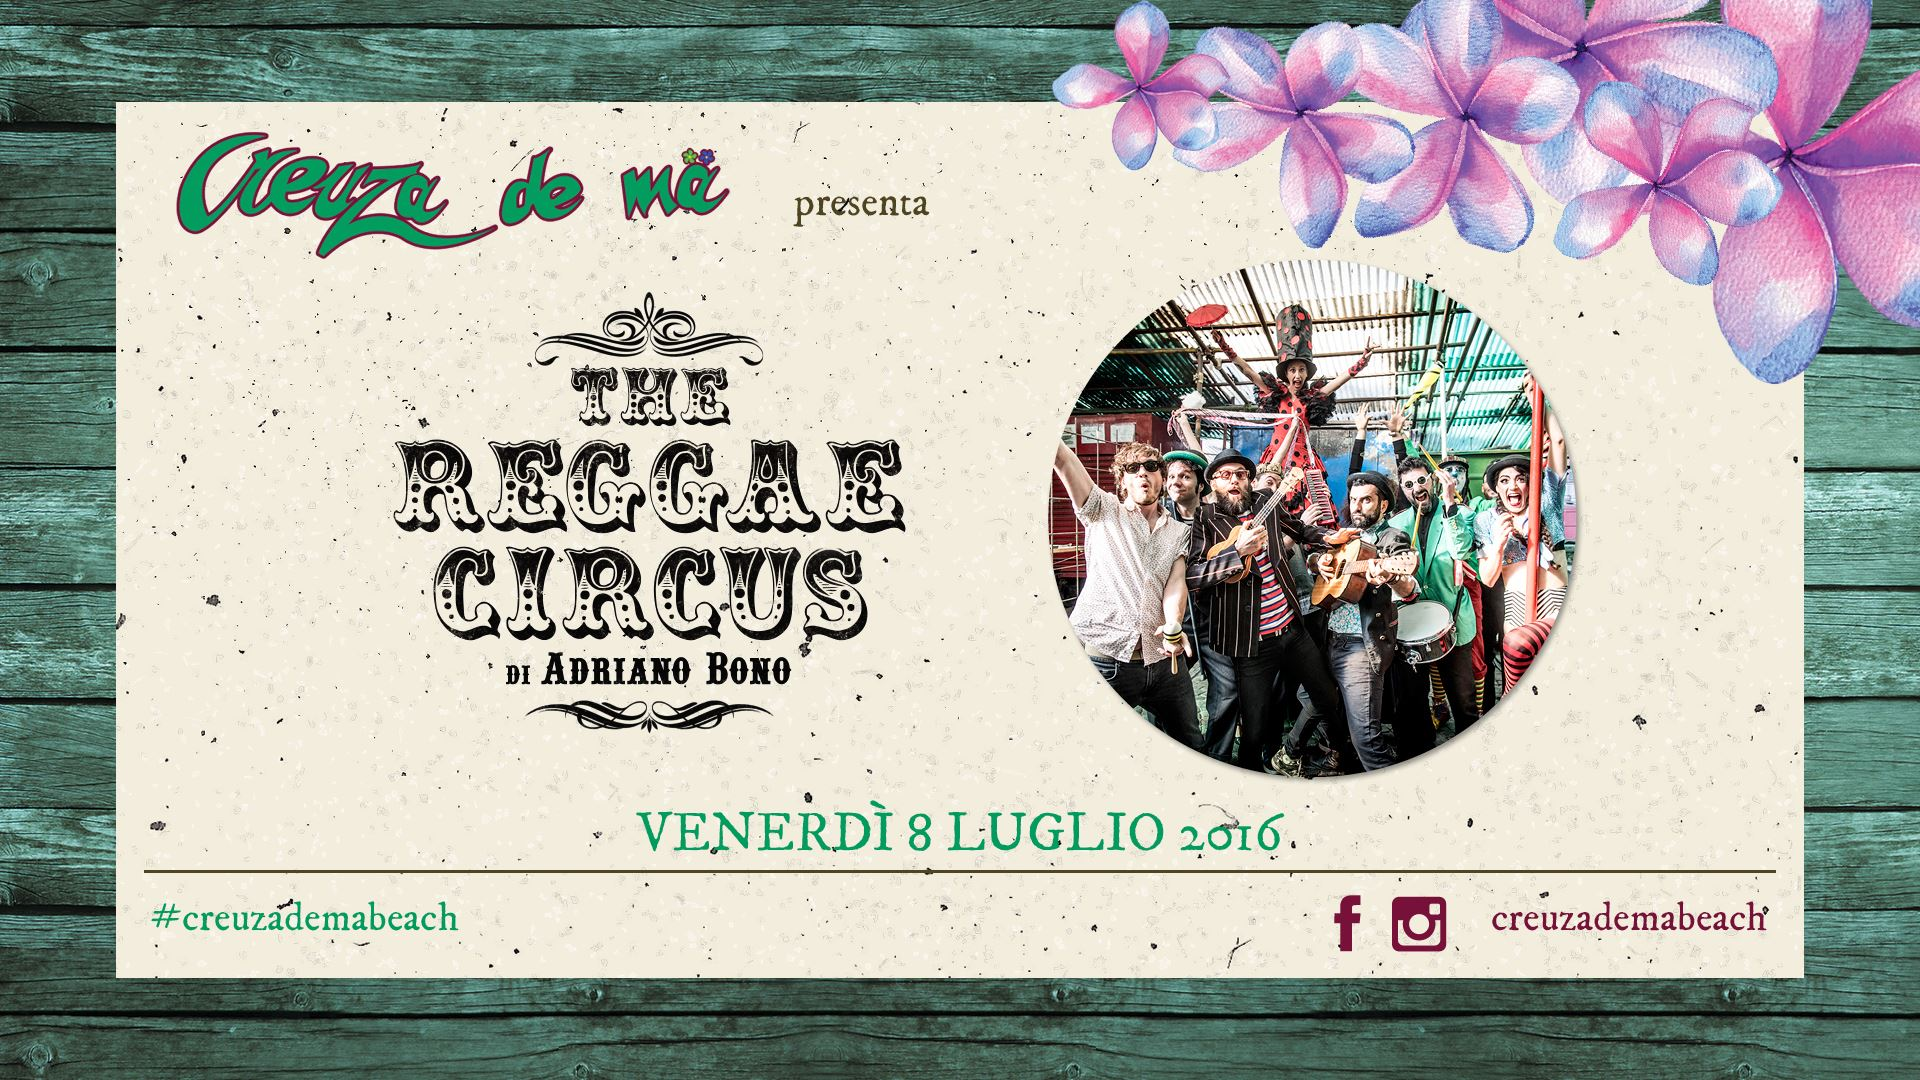 The Reggae Circus_Creuza de Ma 8 luglio